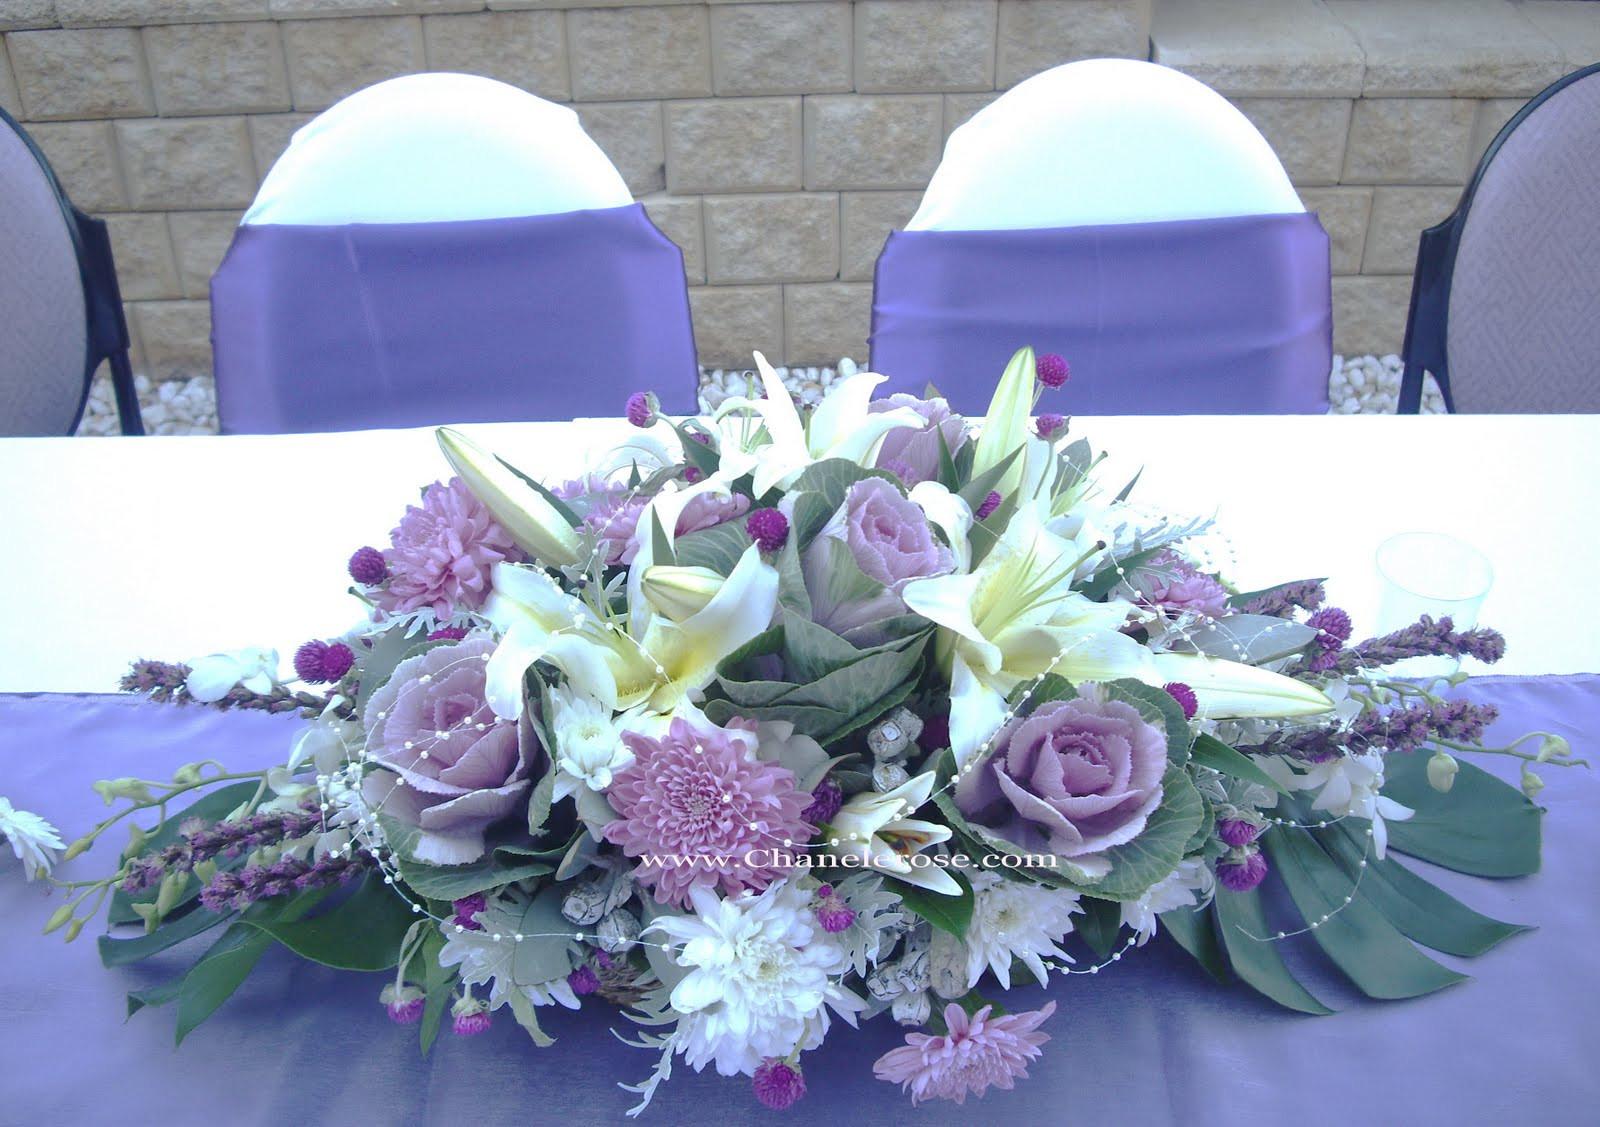 Cheap Engagement Party Ideas Sydney  Chanele Rose Flowers Blog Sydney Wedding stylist